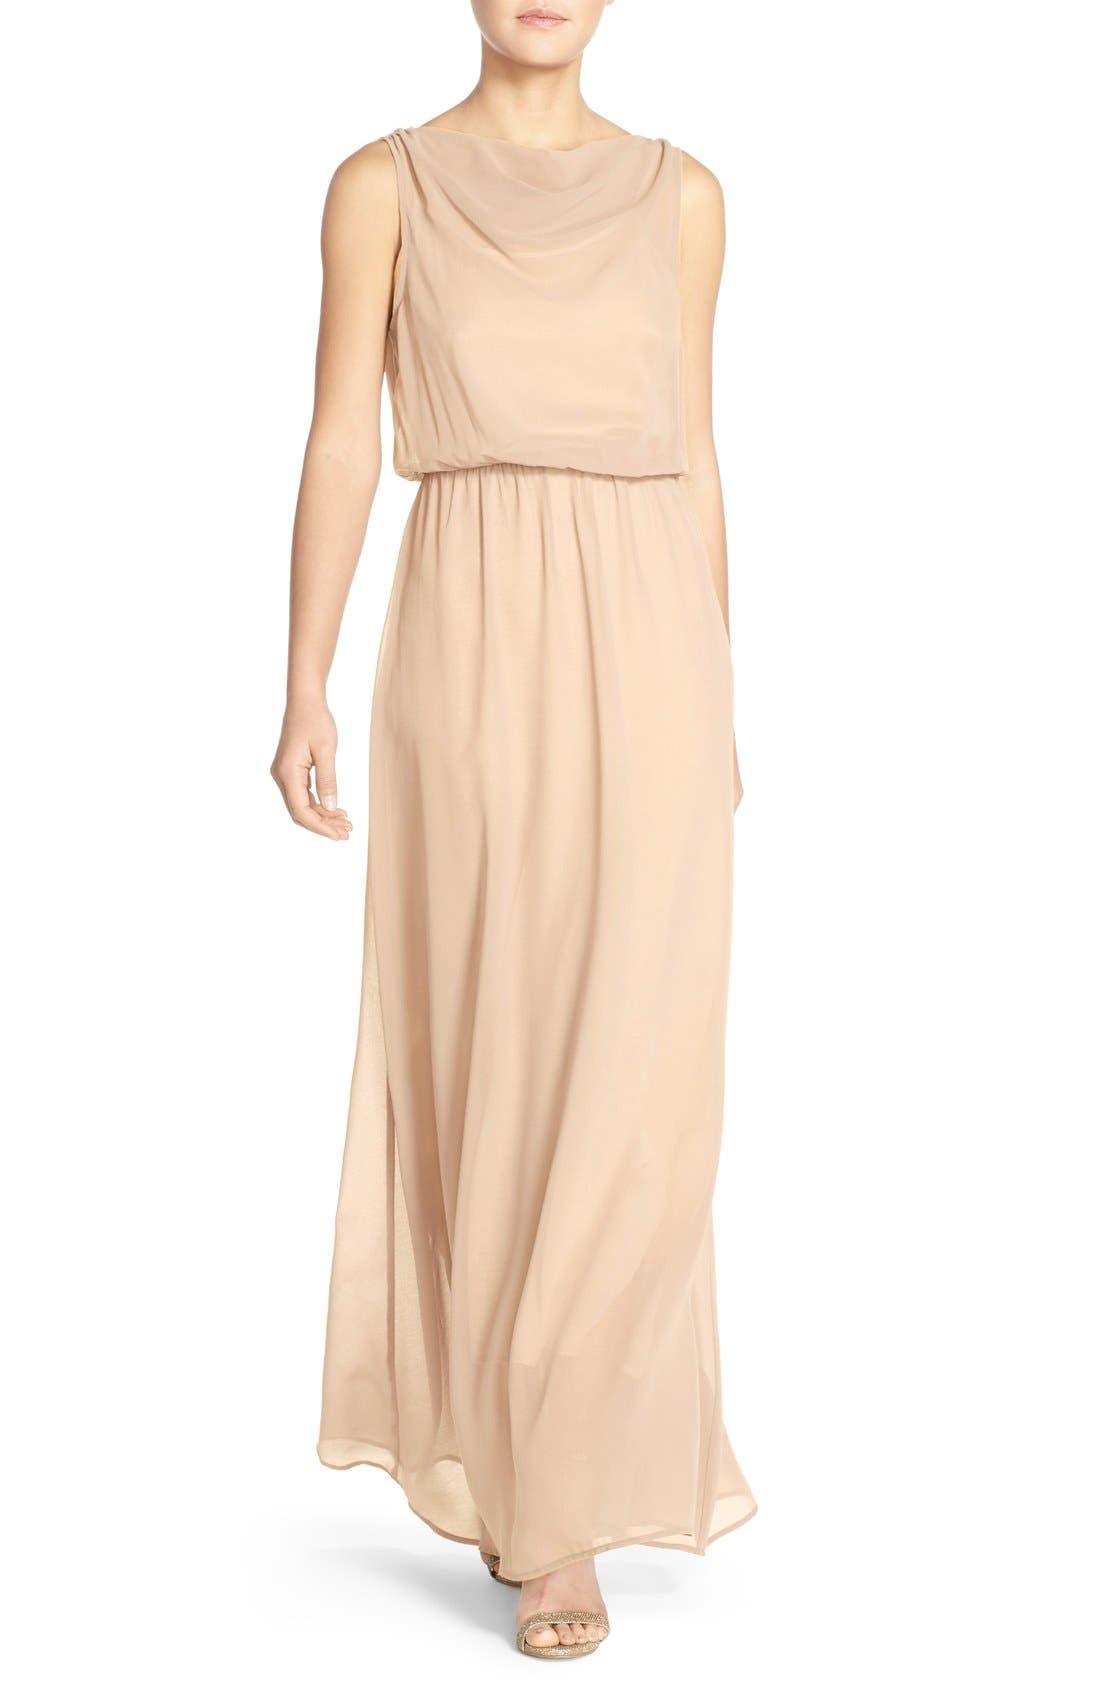 by Lauren Conrad 'Springfield' Cowl Neck Chiffon Gown,                         Main,                         color, Cream